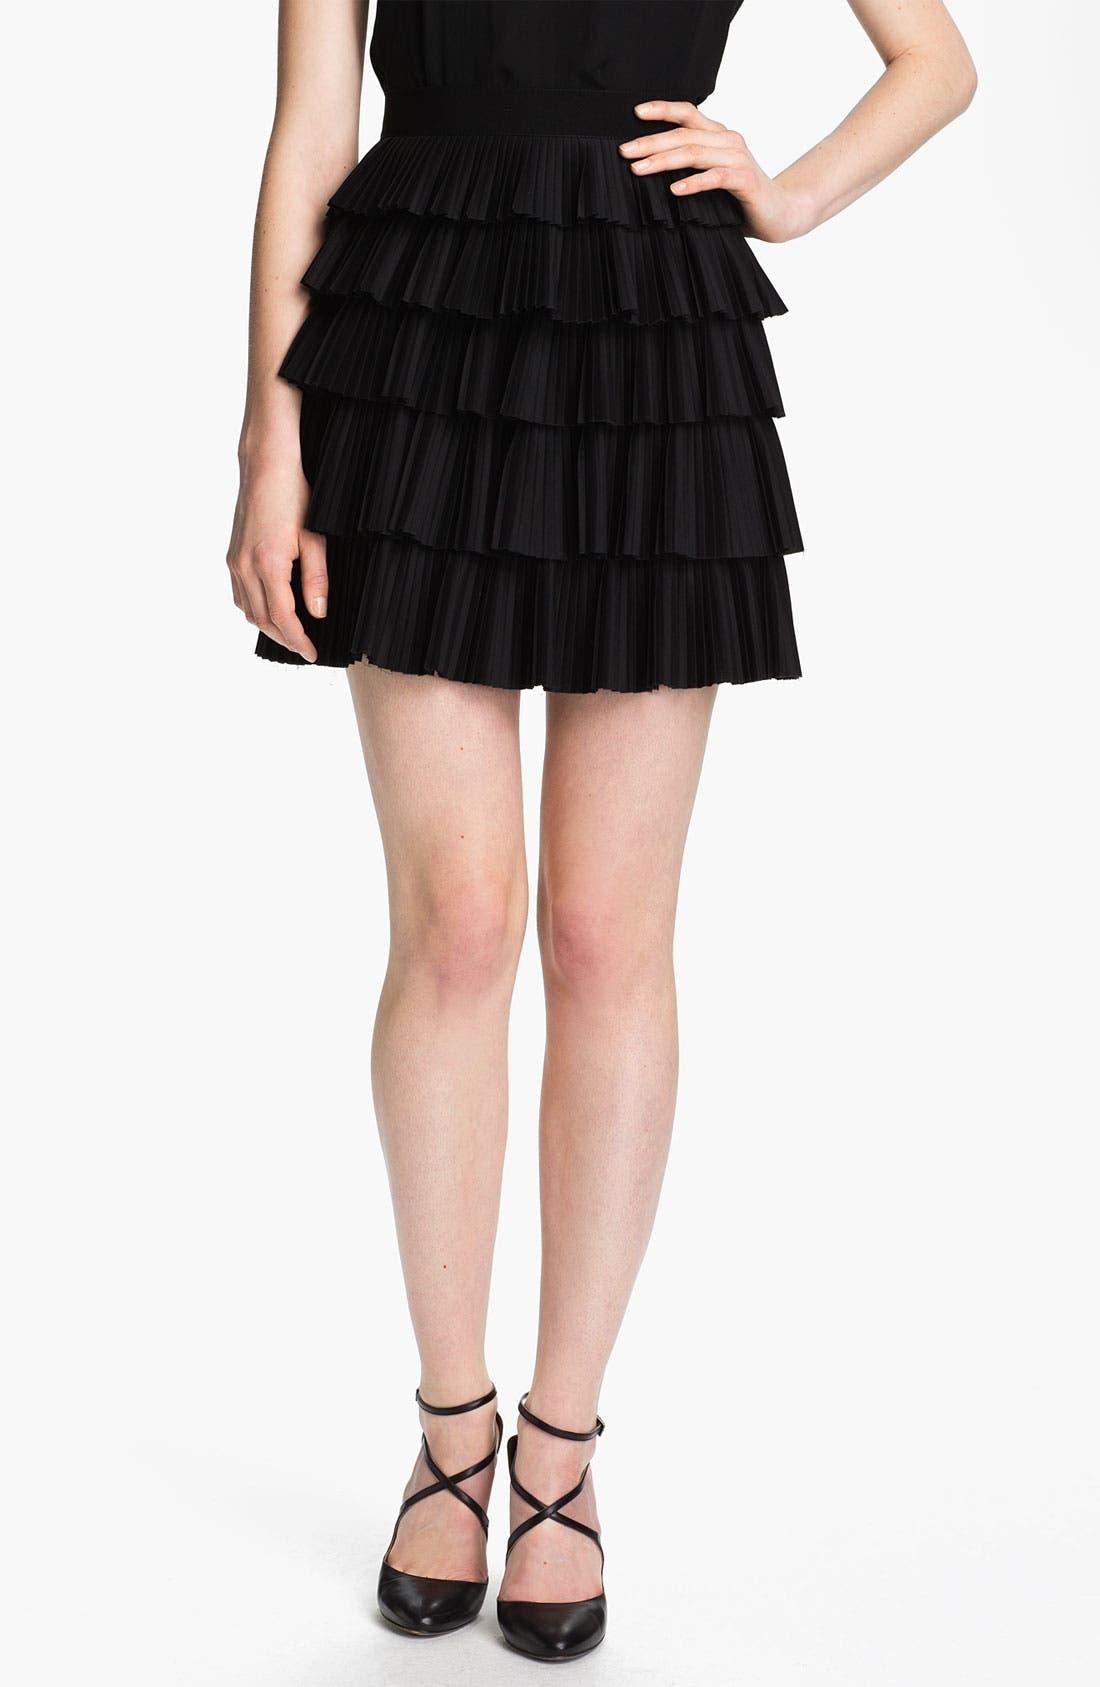 Alternate Image 1 Selected - Robert Rodriguez Tiered Skirt